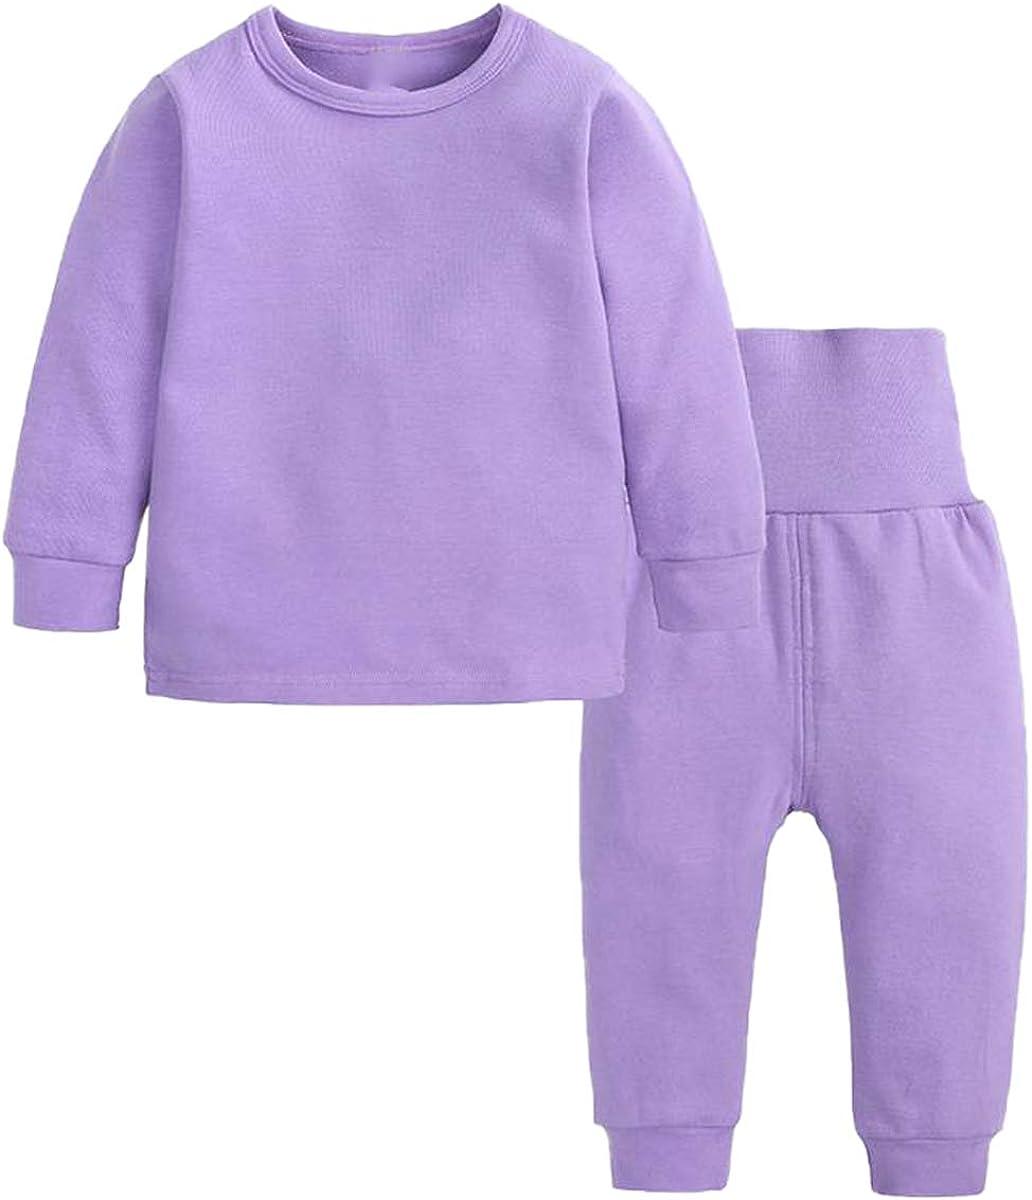 Toddler Girl's Thermal Underwear Set Base Layer Top & Bottom Set, Purple, 2-3T = Tag 110